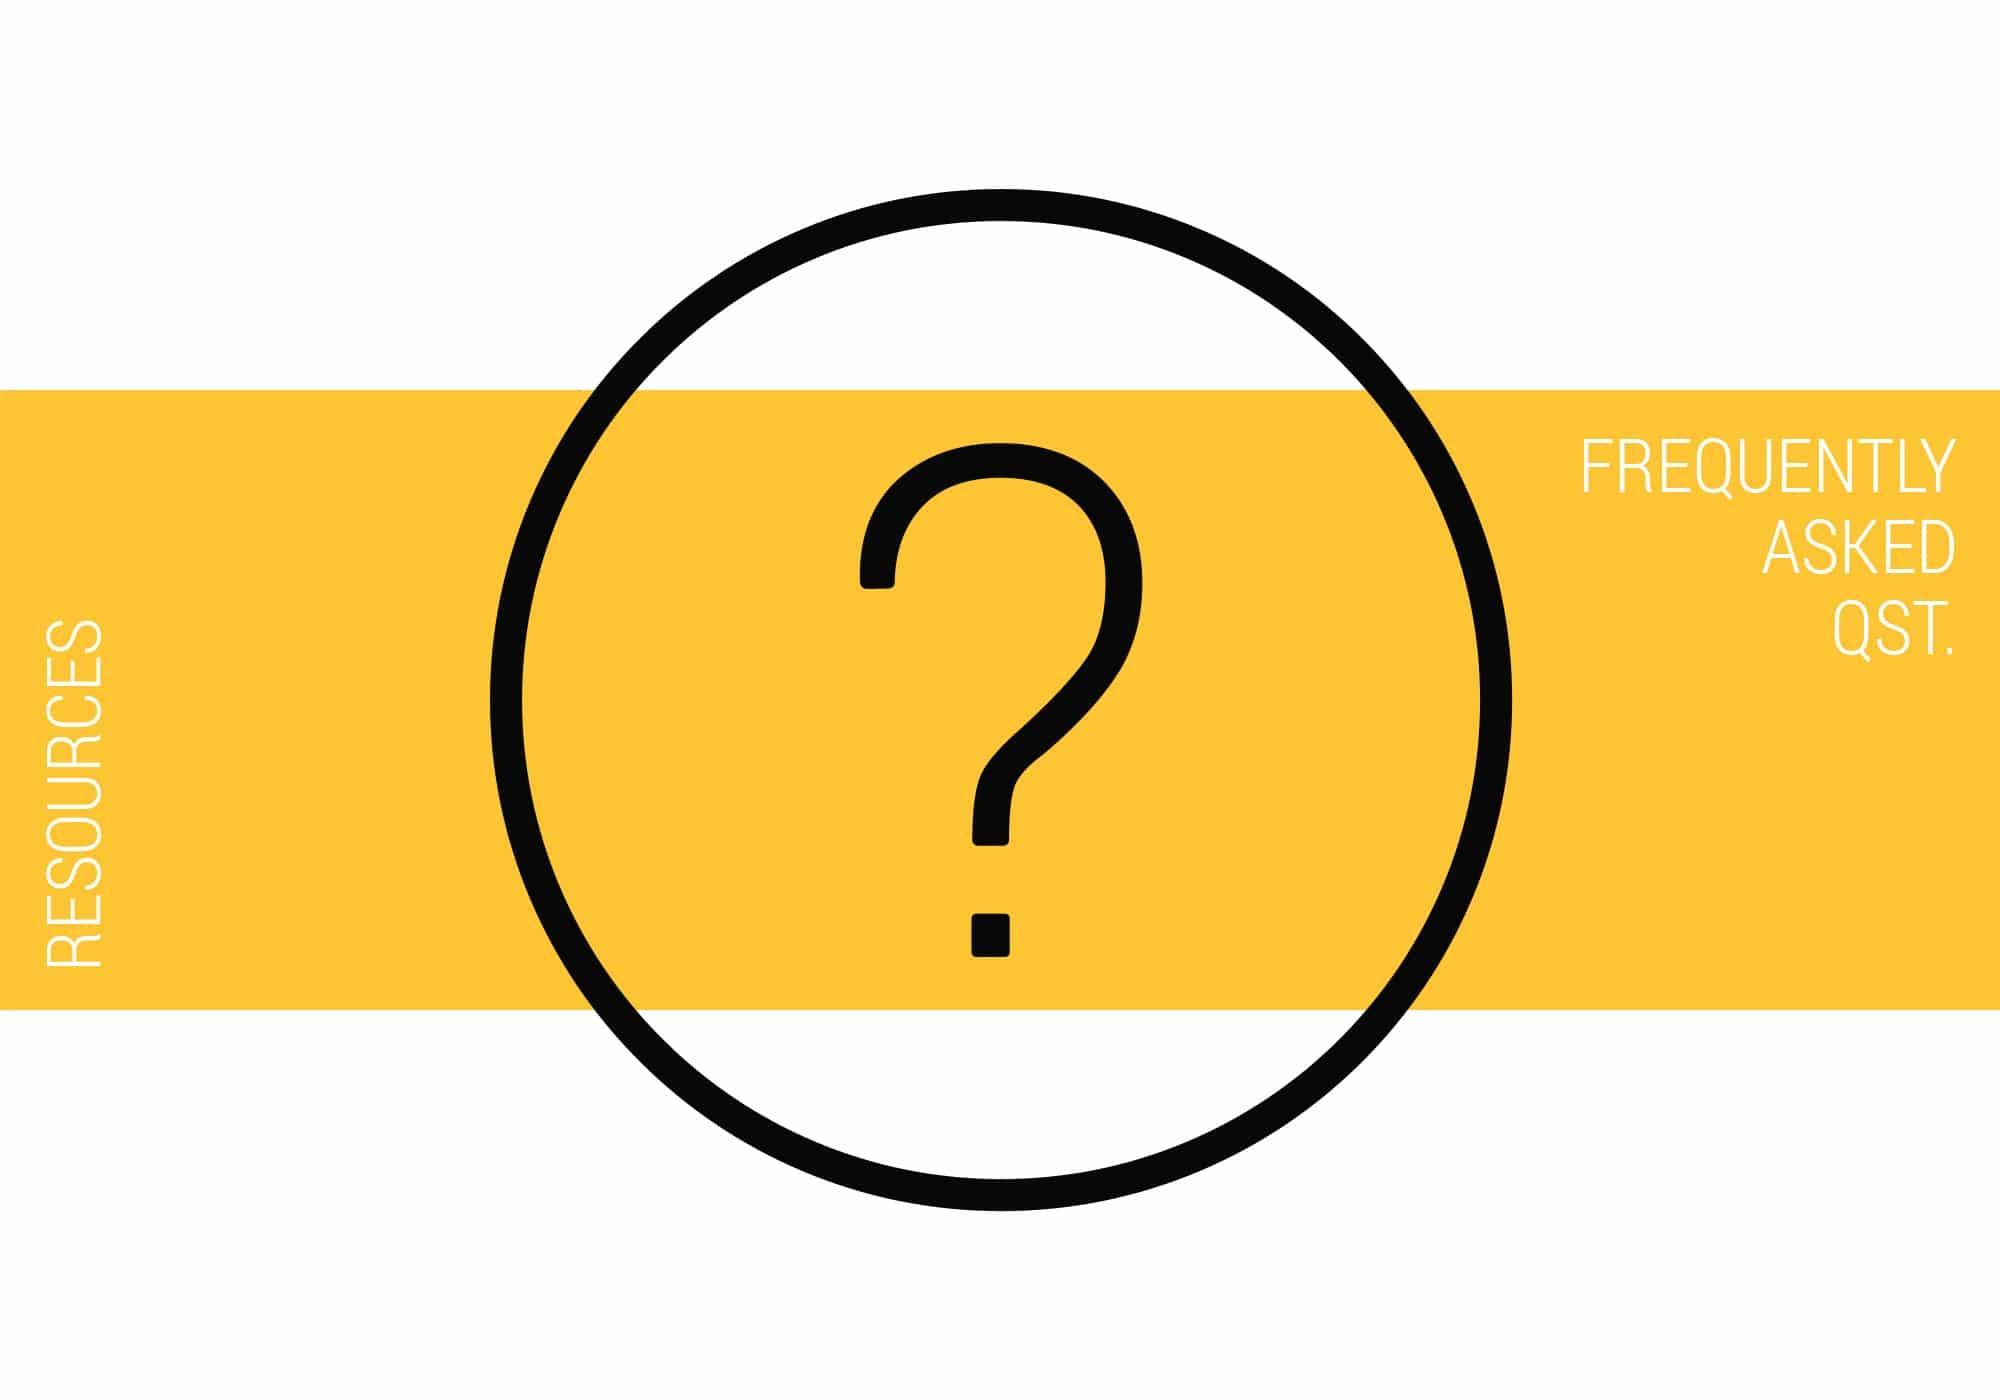 BizzOnWheels product FAQ